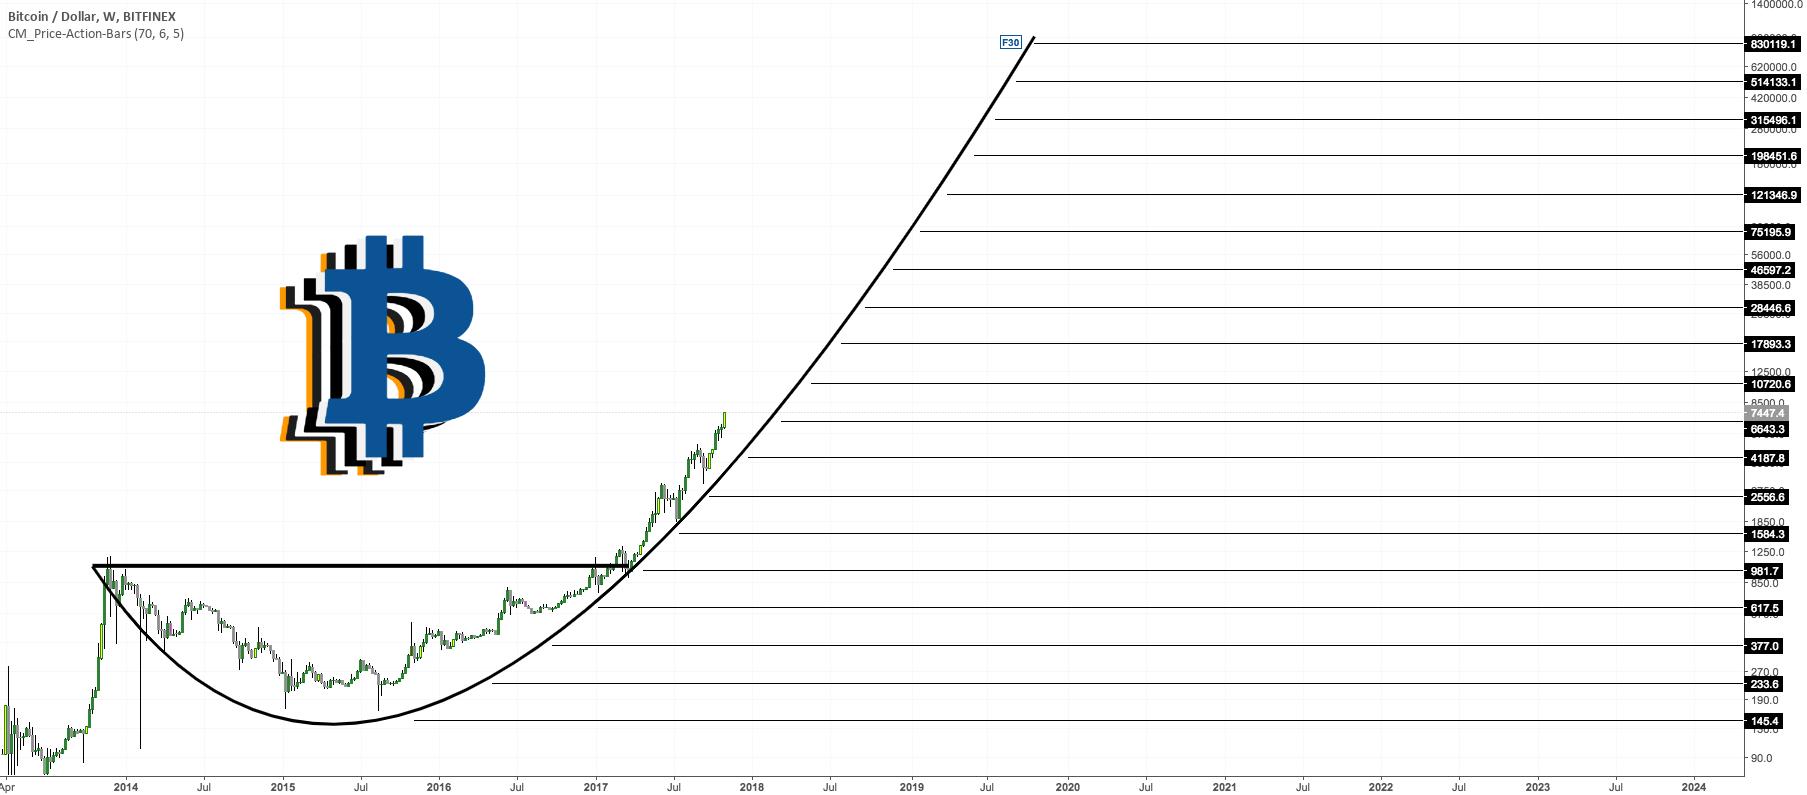 BTC Bullish pattern Ascending Scallop